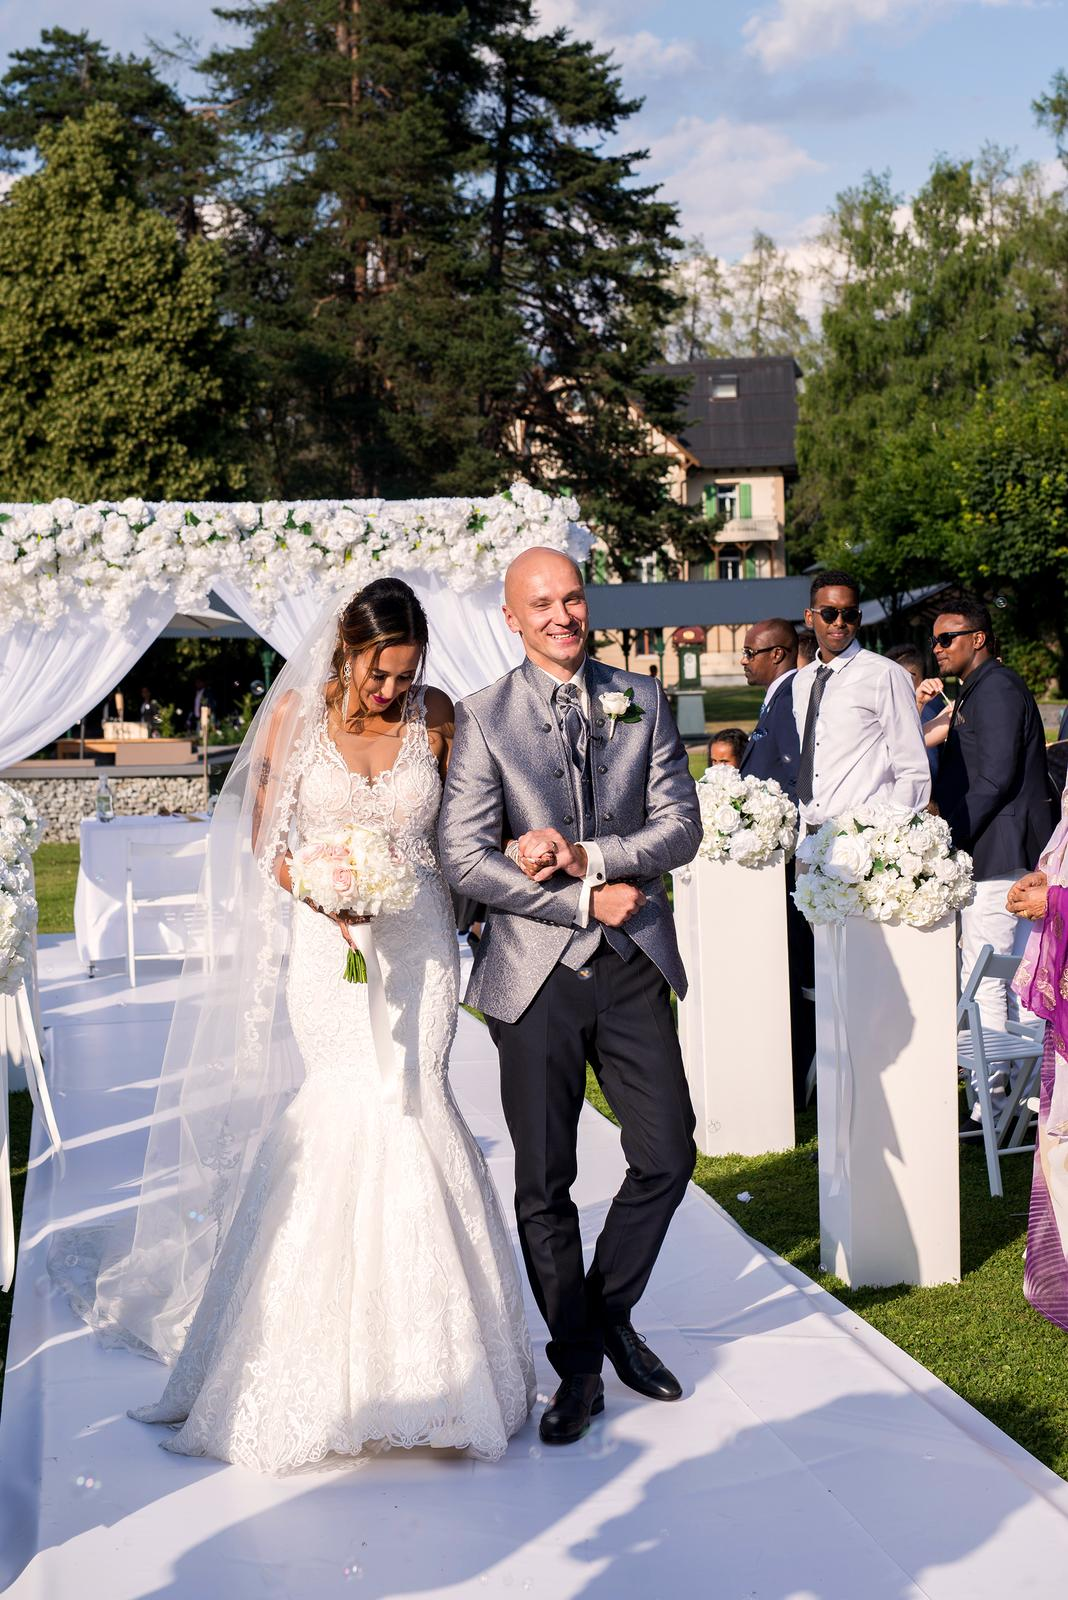 Svadba Zahra a Milan - Obrázok č. 50